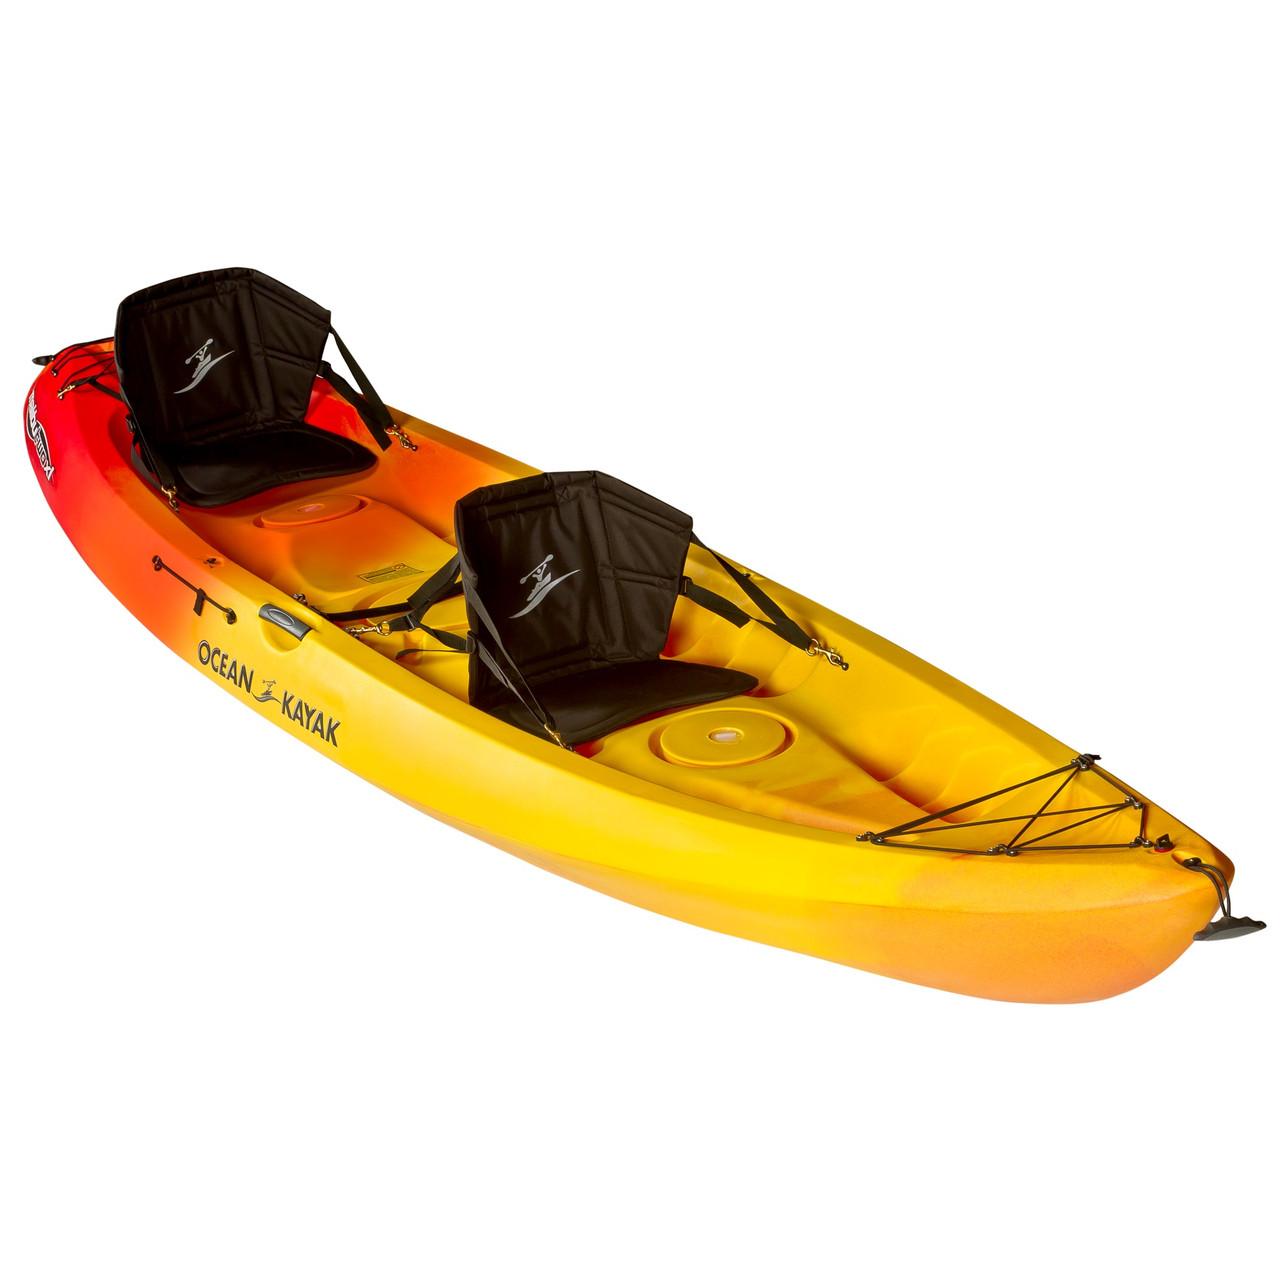 Ocean Kayak Malibu Two XL sun